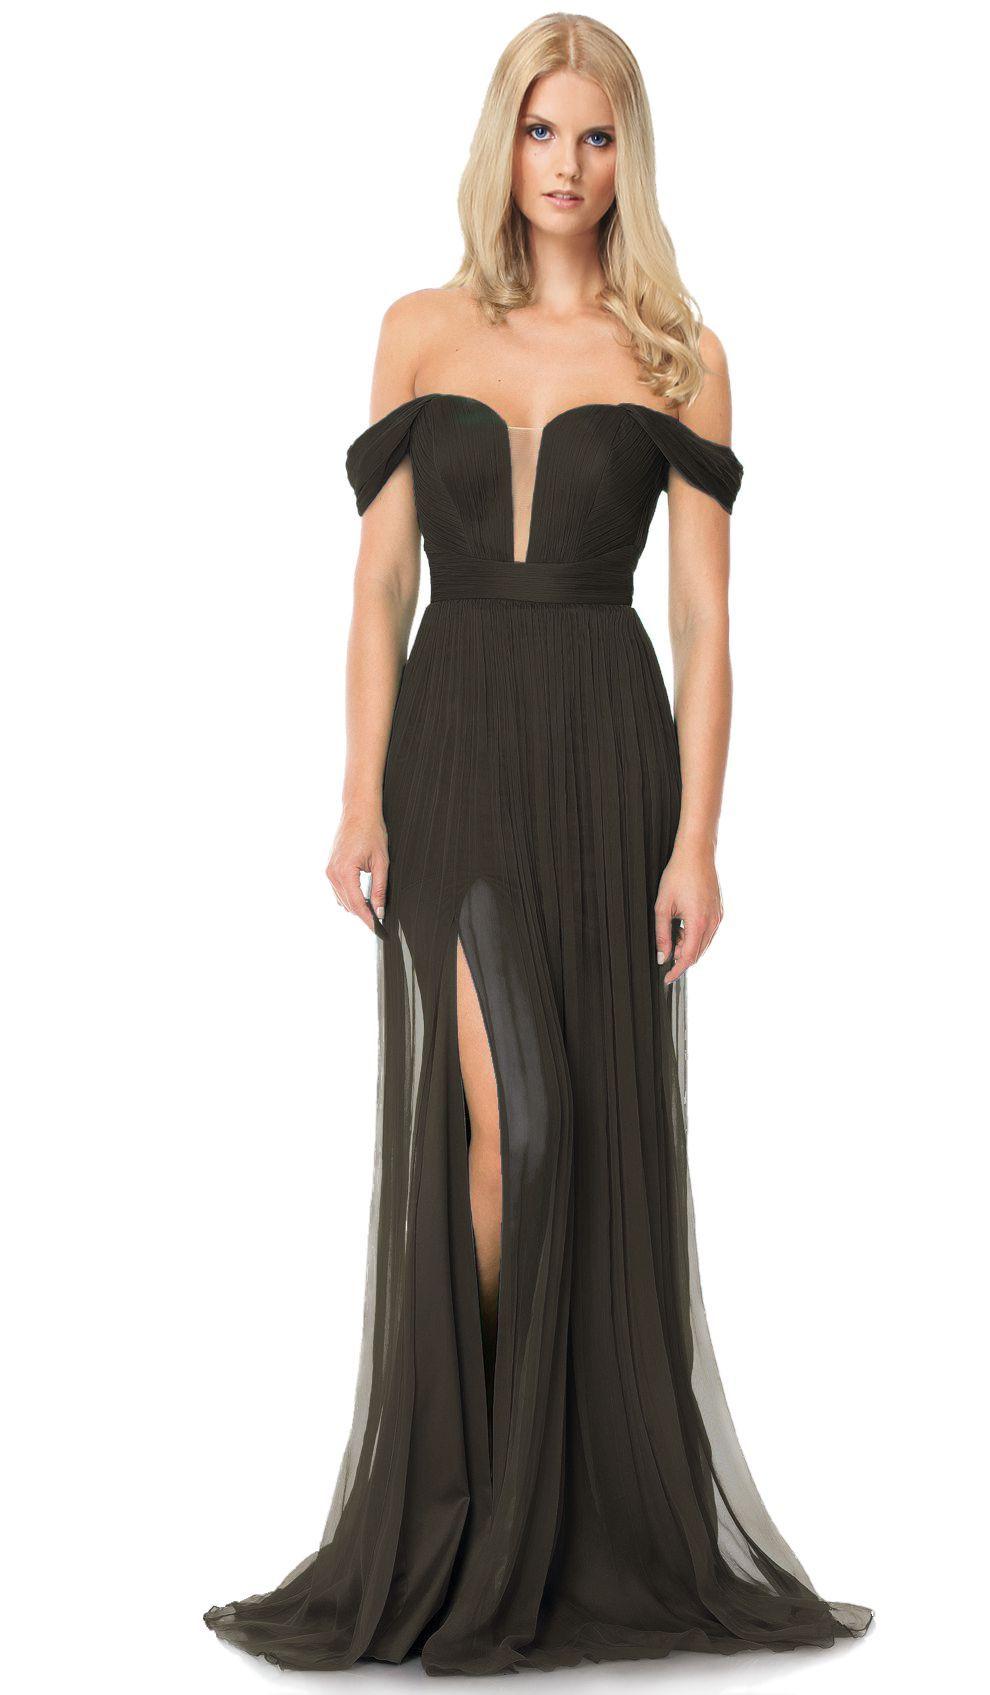 Cristallini Off The Shoulder Black Gown Designer Dress Hire And